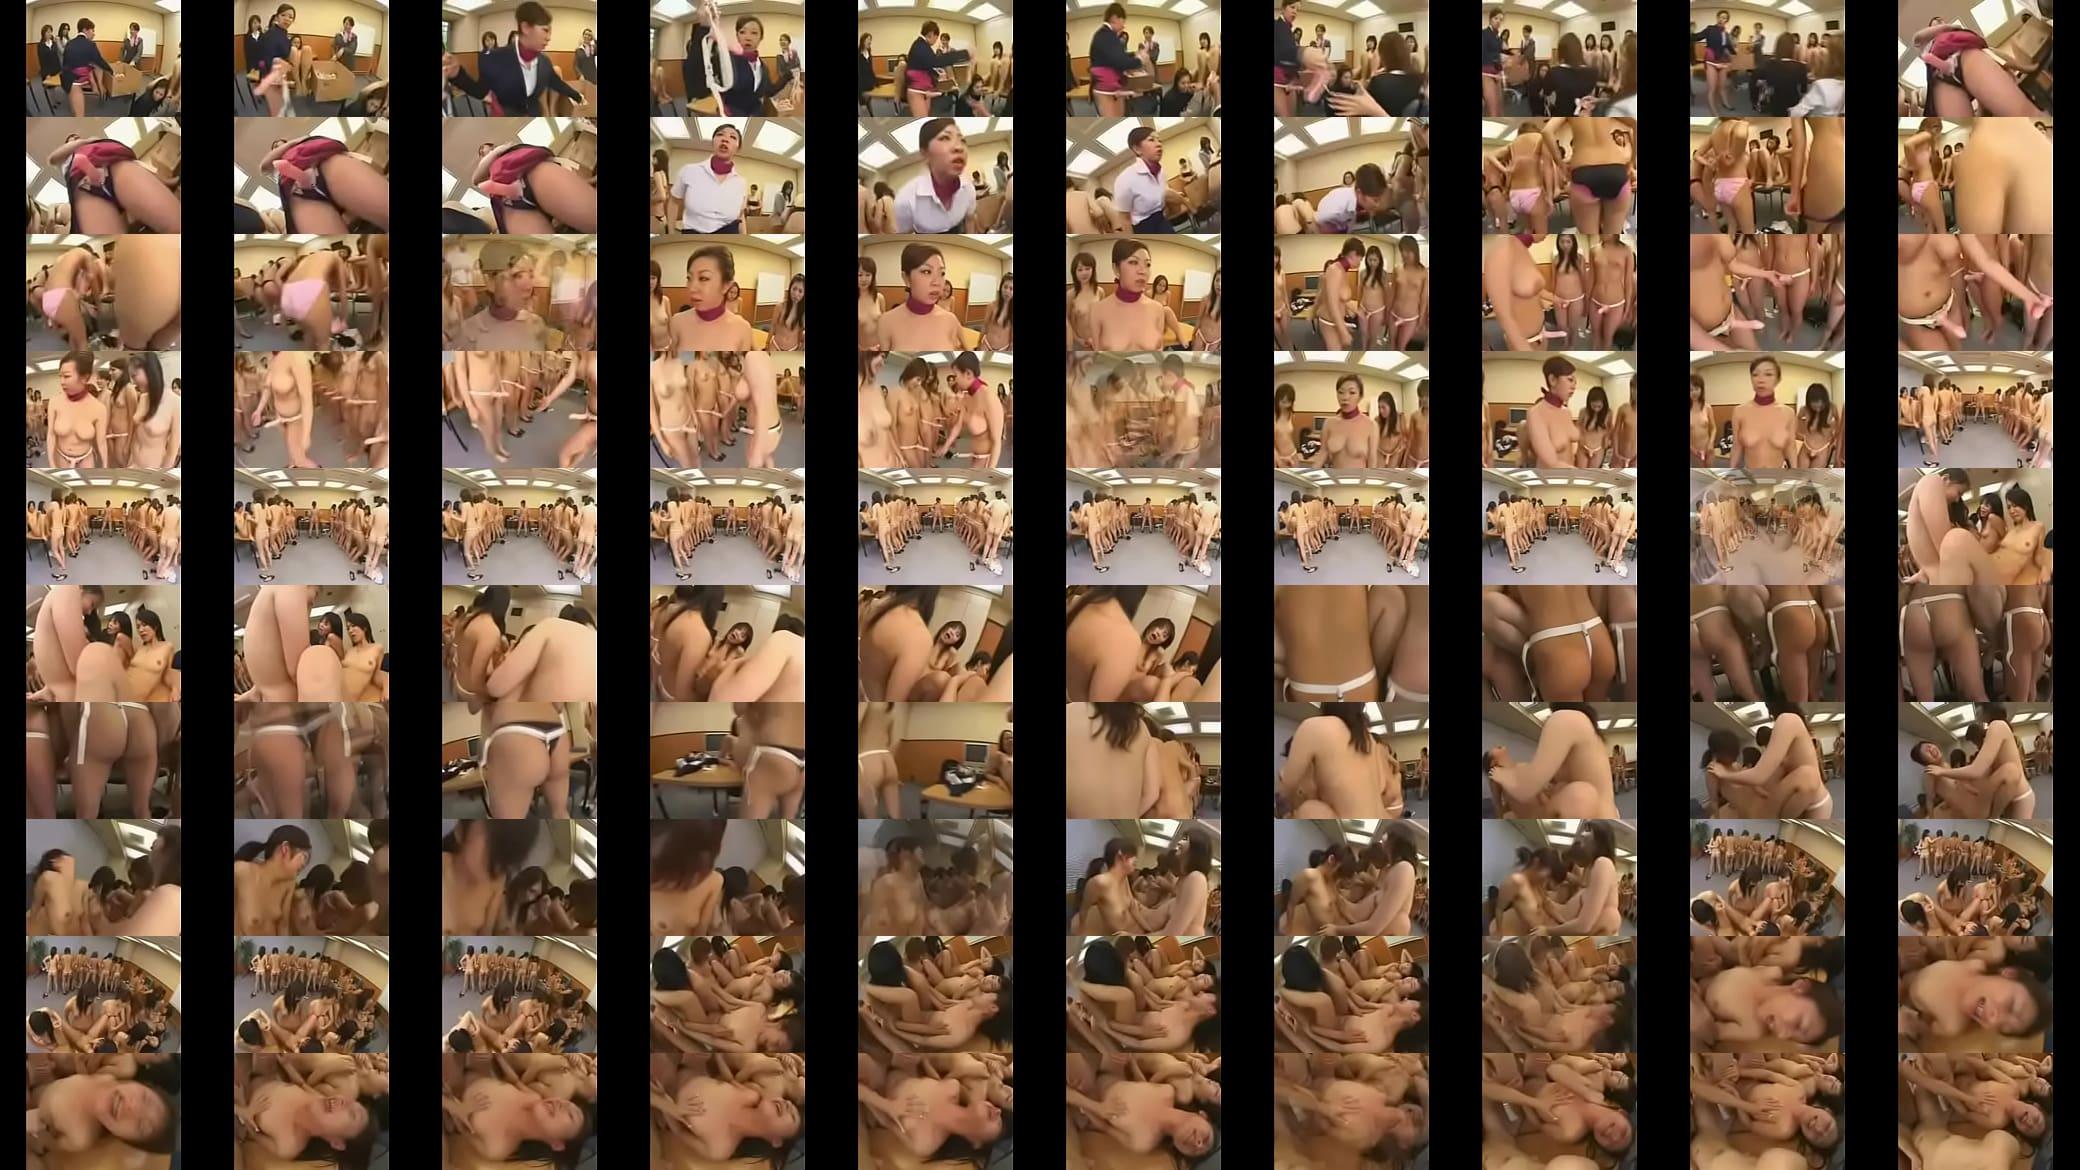 Jakart school girl nude